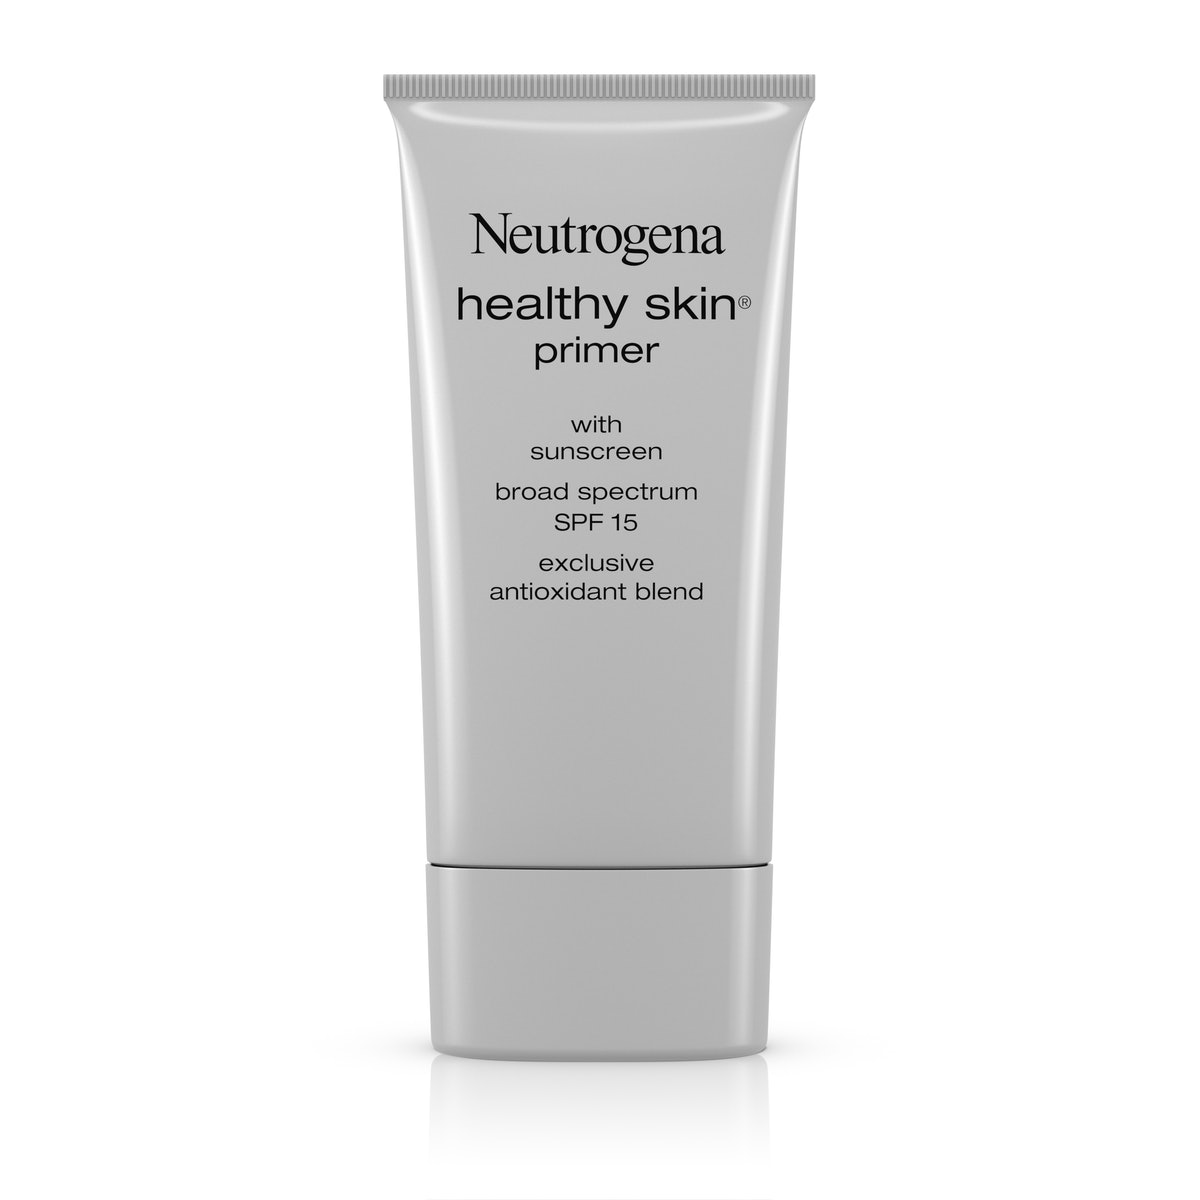 Neutrogena Healthy Skin Primer Broad Spectrum SPF 15